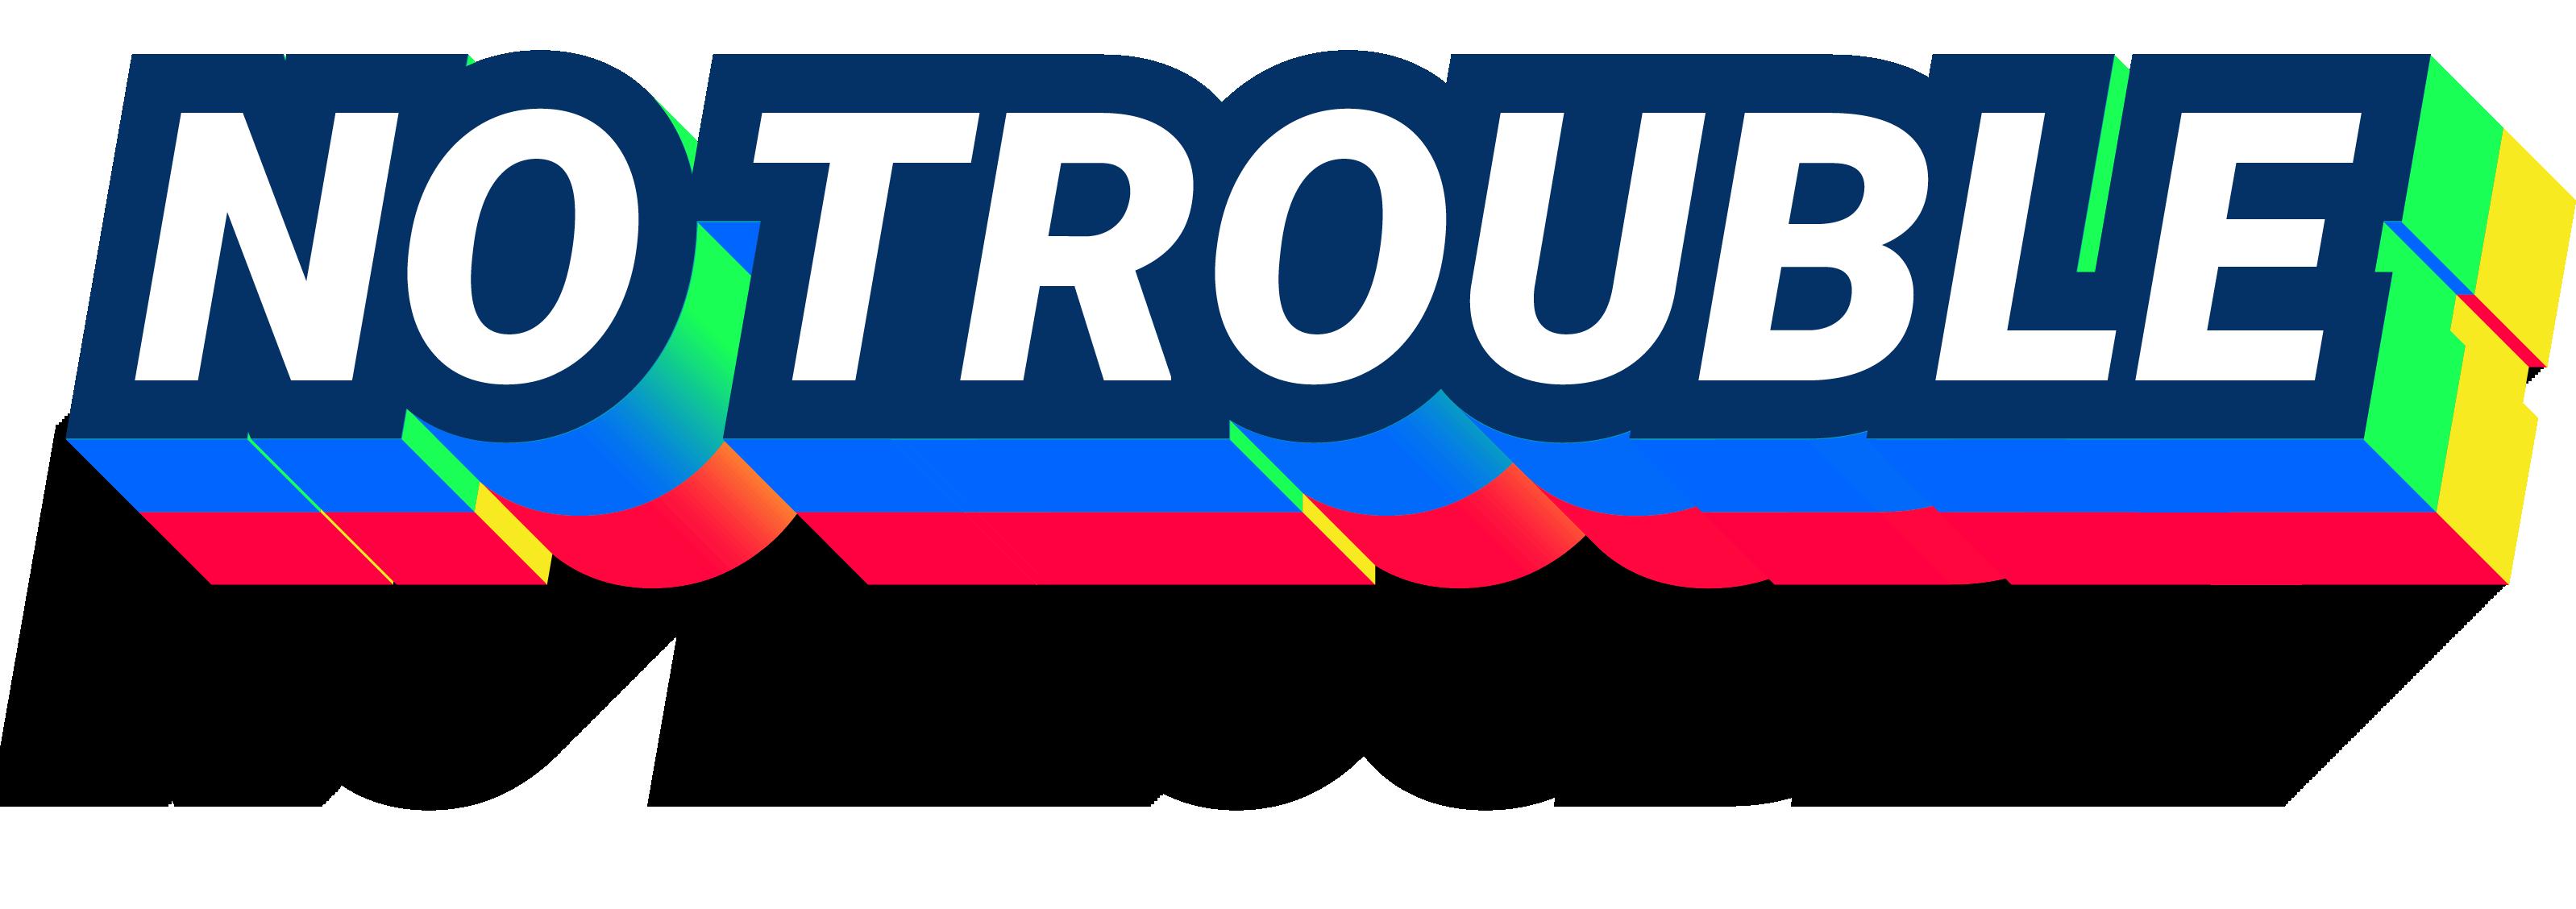 No Trouble